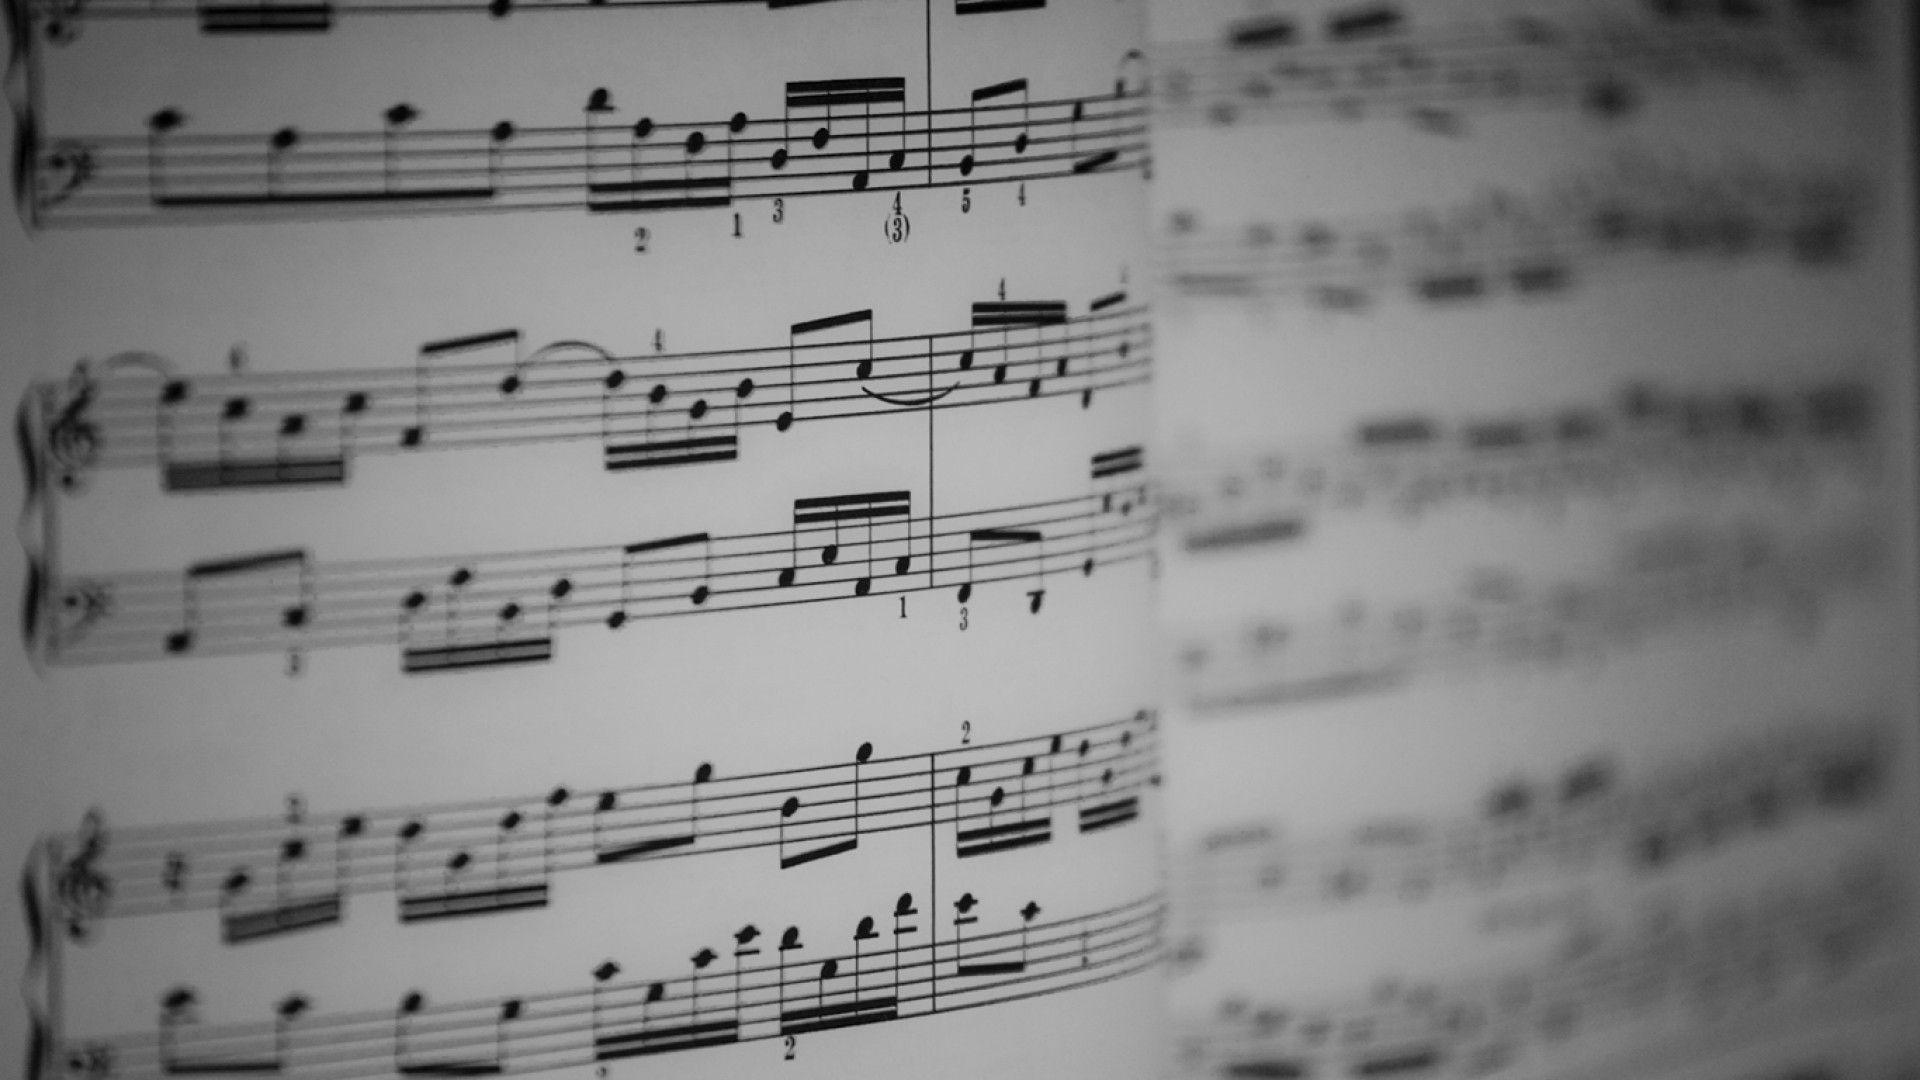 Music Desktop Backgrounds - Wallpaper Cave